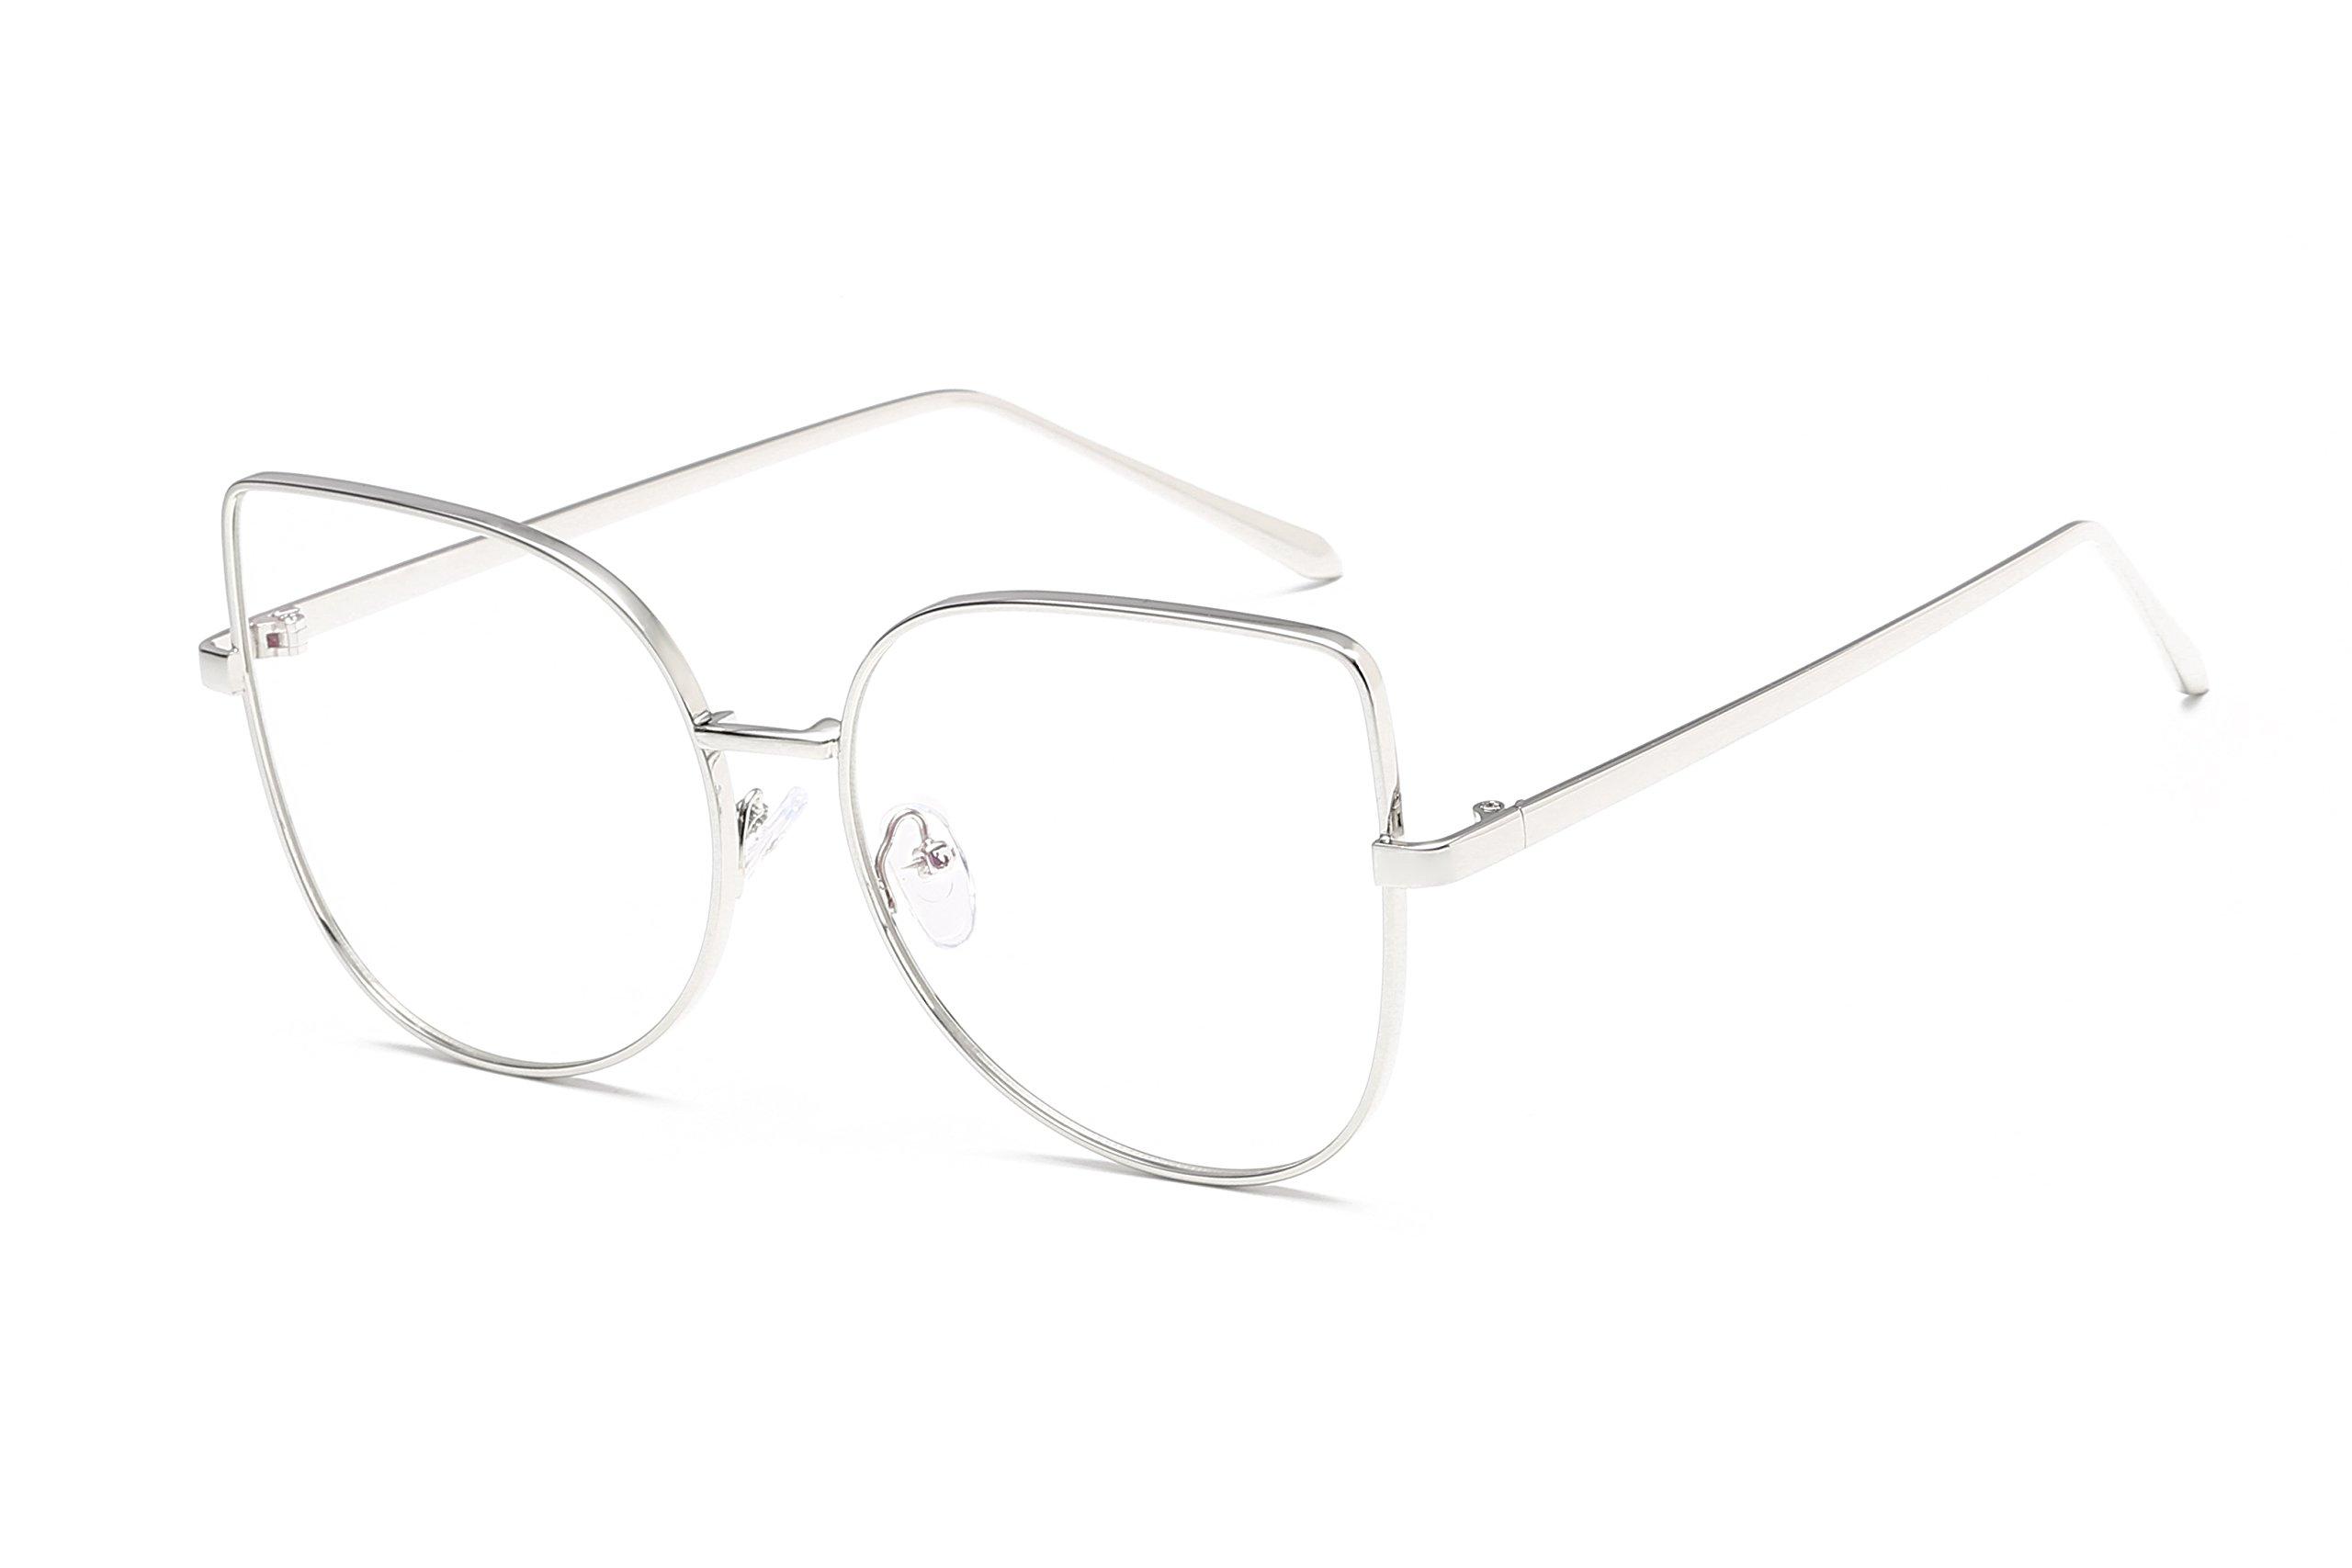 Embryform Metal Vintage Retro Clear Lens Unisex Glasses